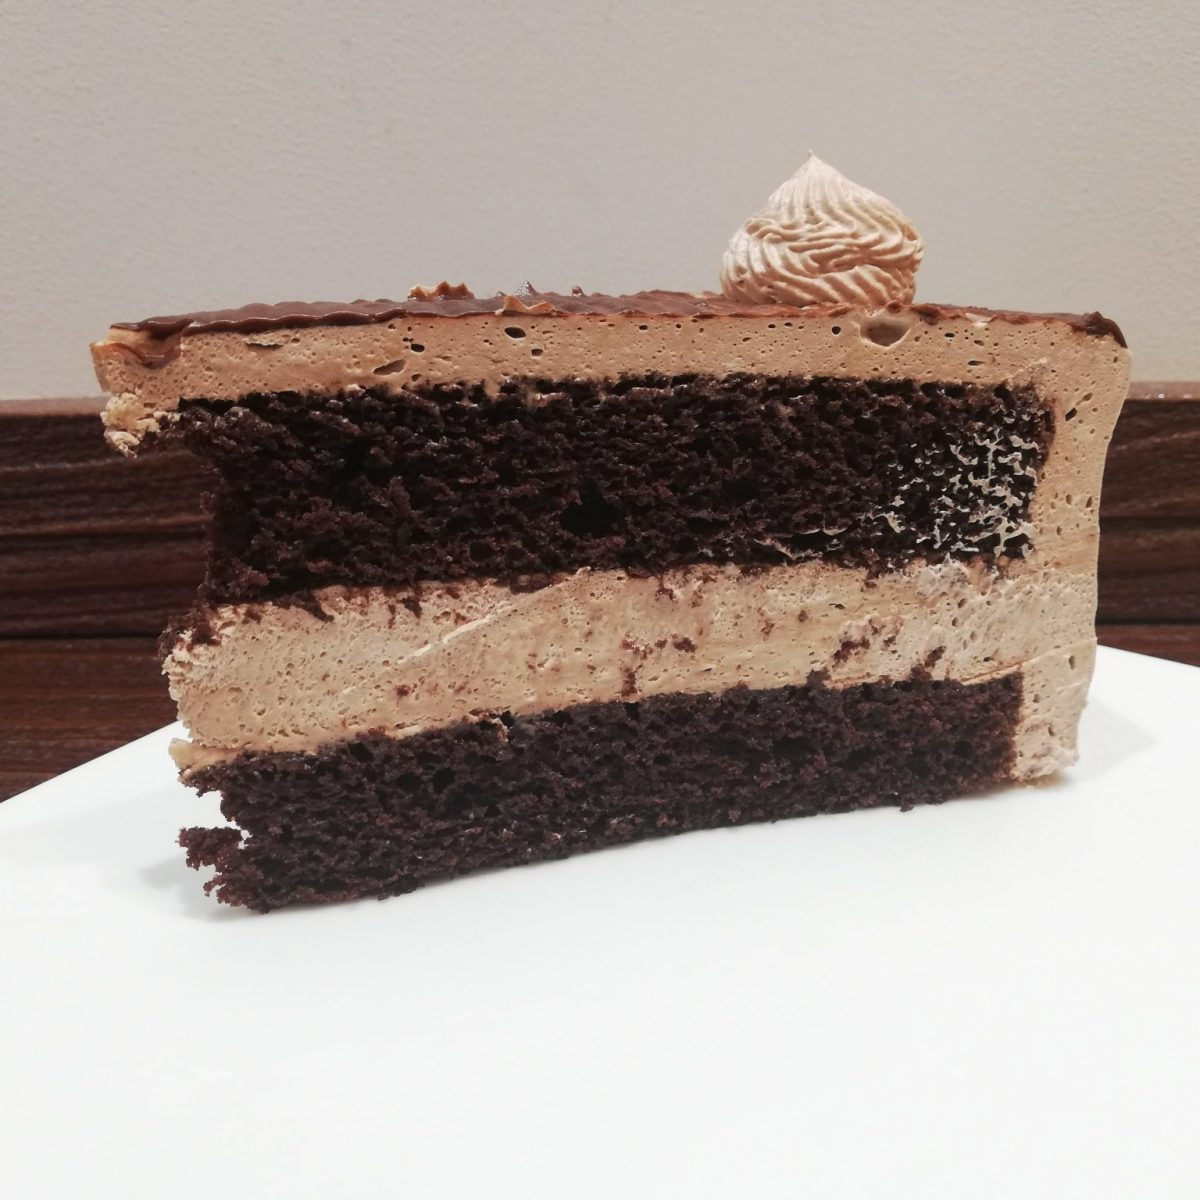 Vegan cake at Freedom Cakes in Madrid